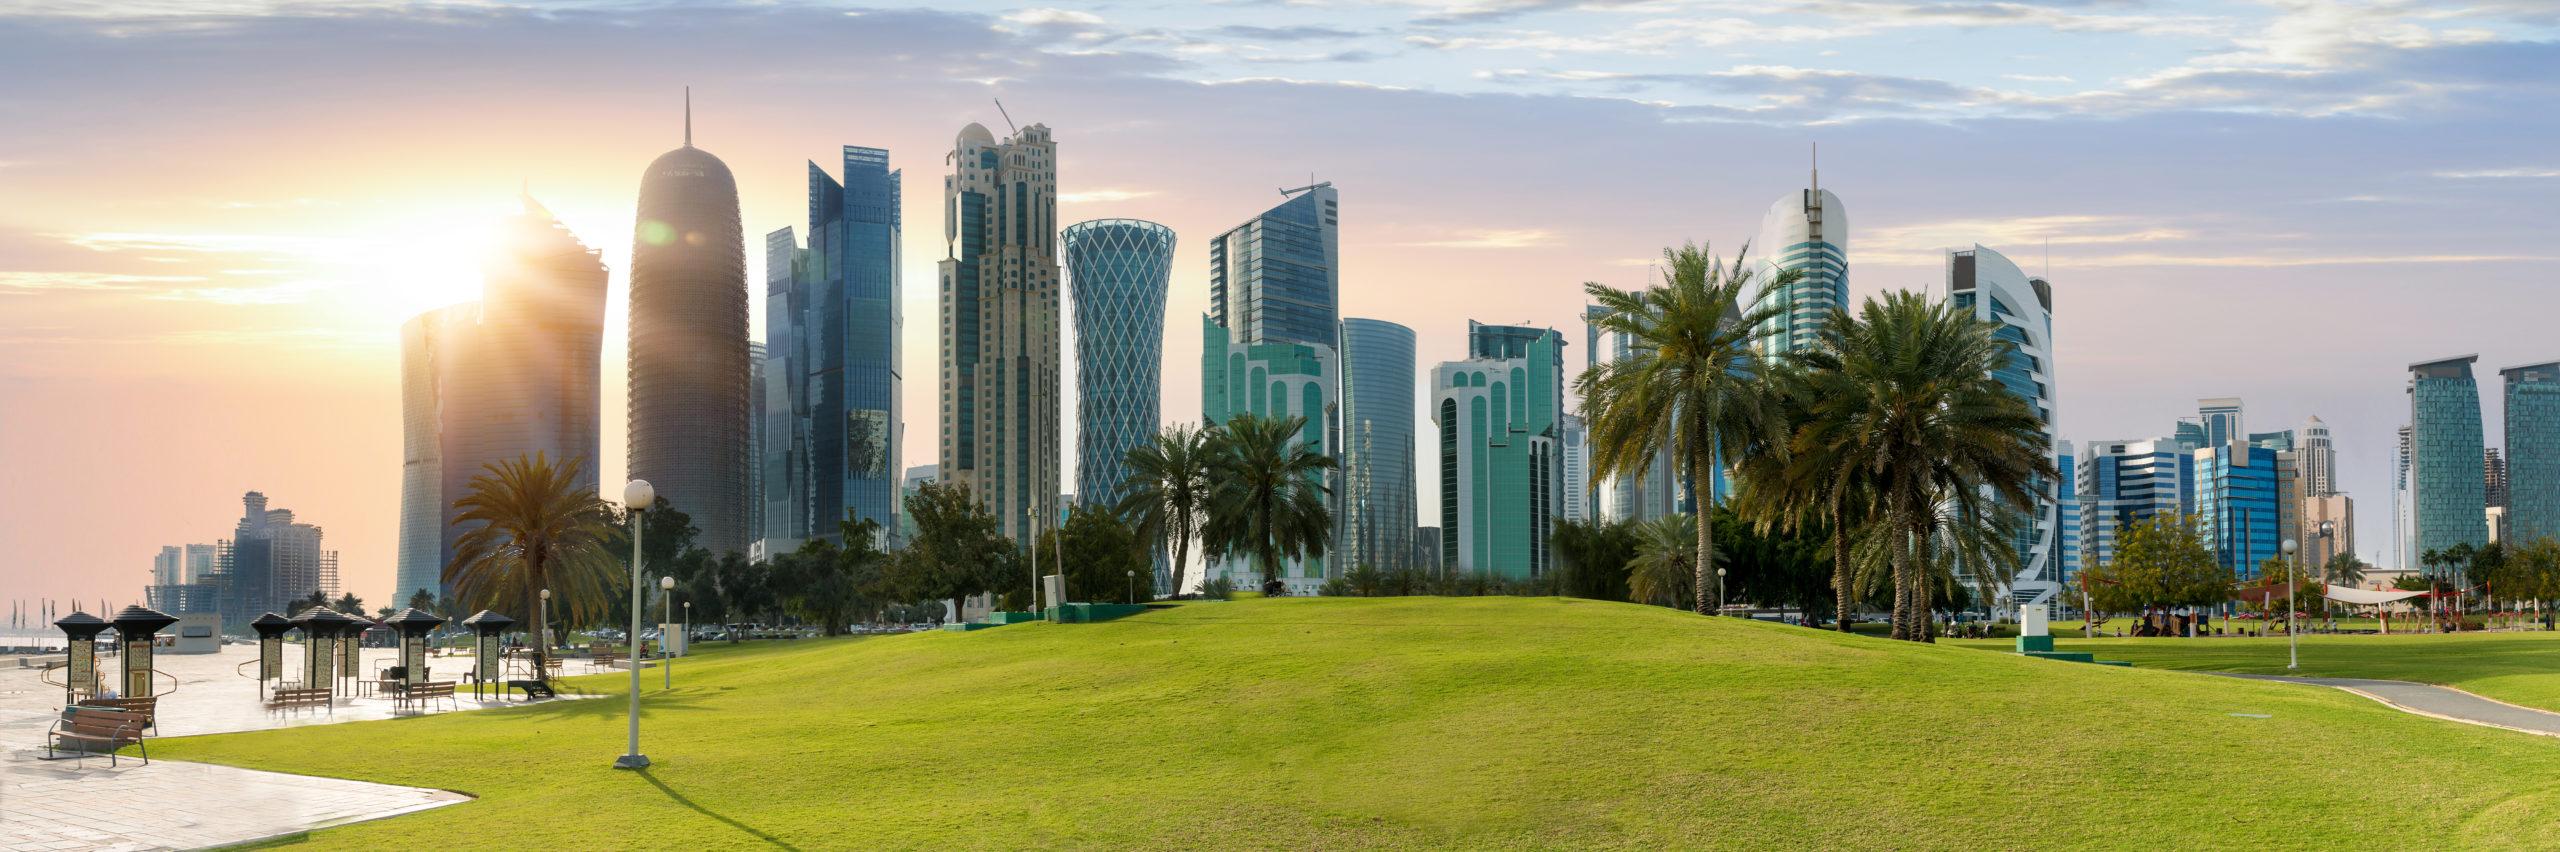 Qatar [Shutterstock]